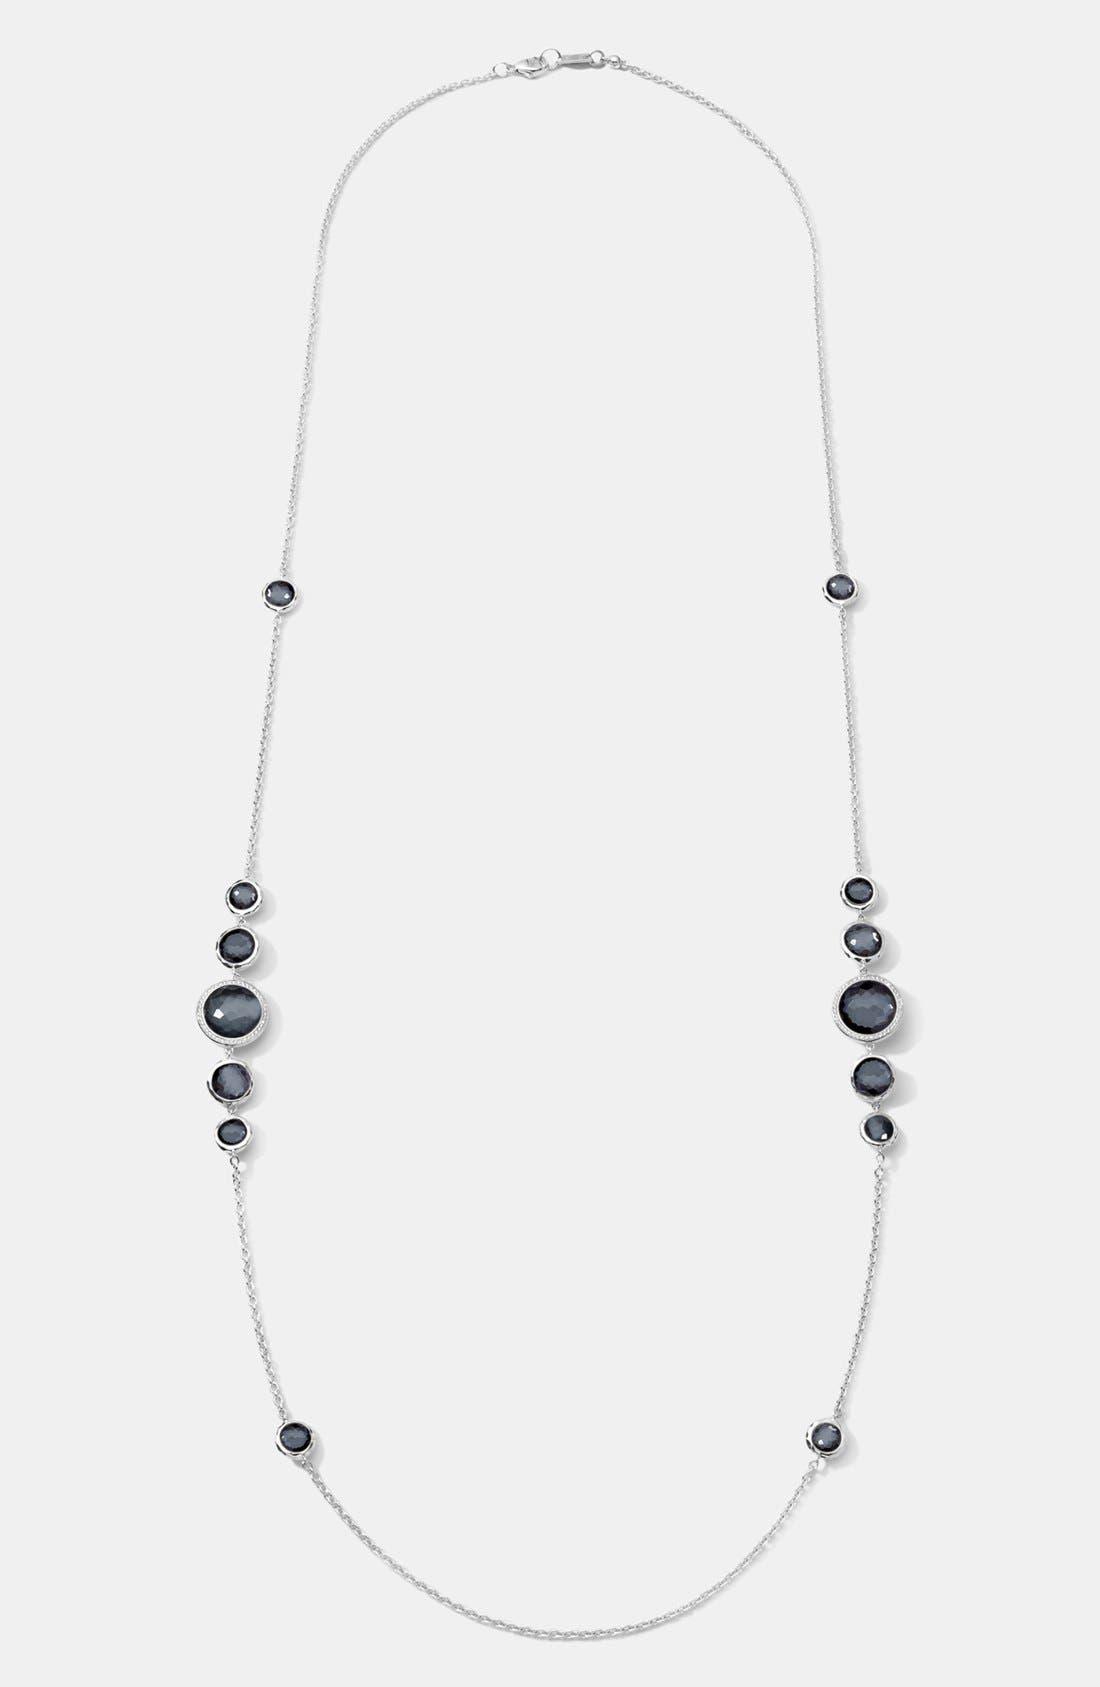 Main Image - Ippolita 'Stella' Long Station Necklace